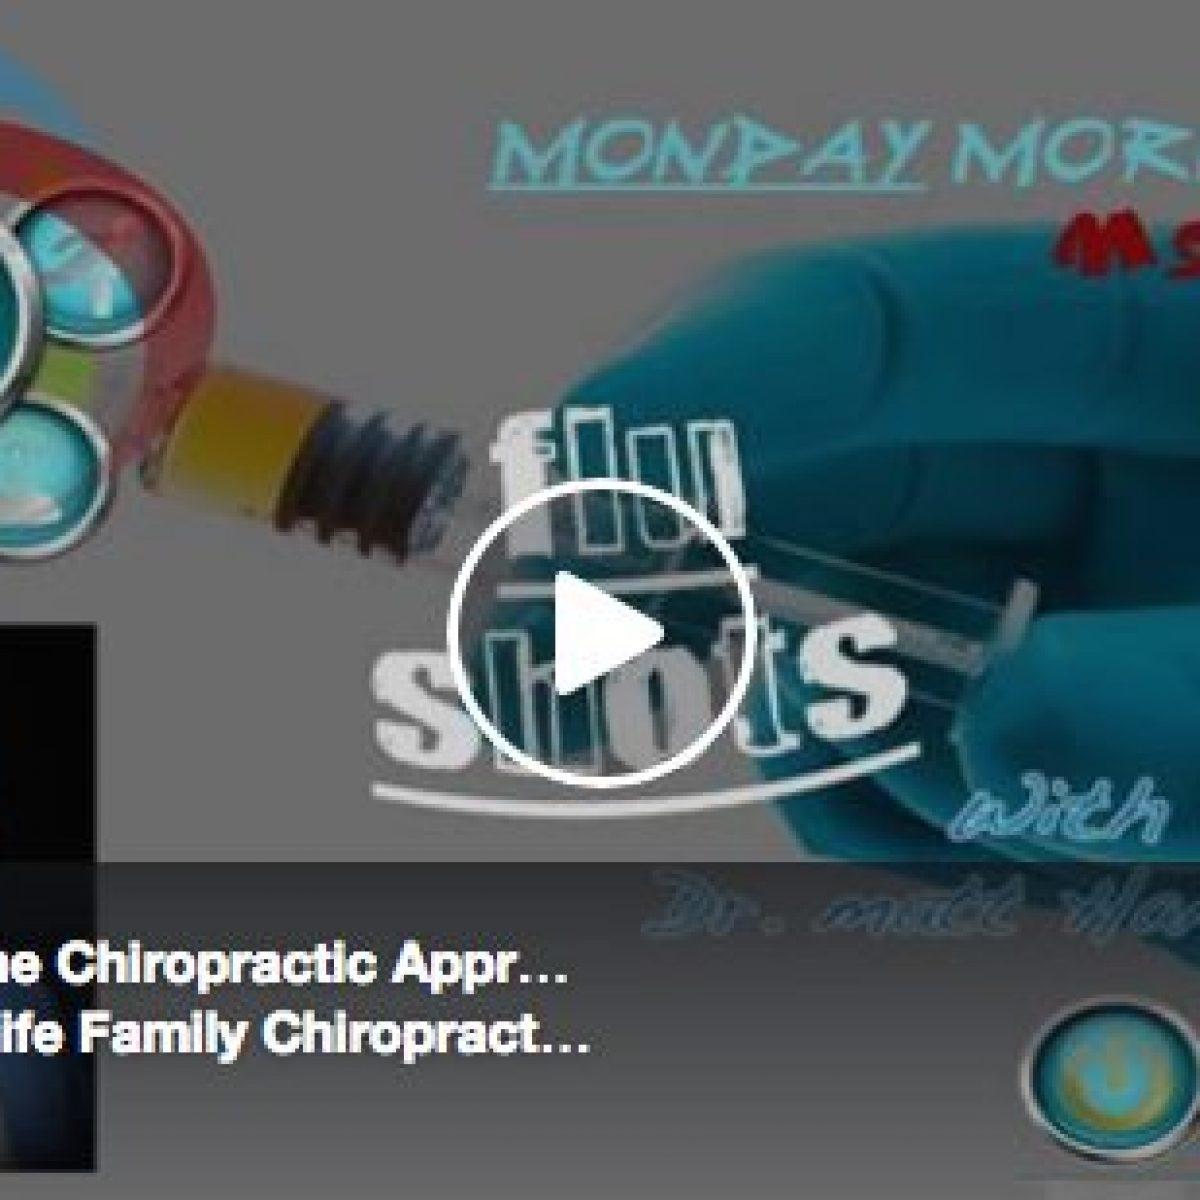 Flu Shots & The Chiropractic Approach